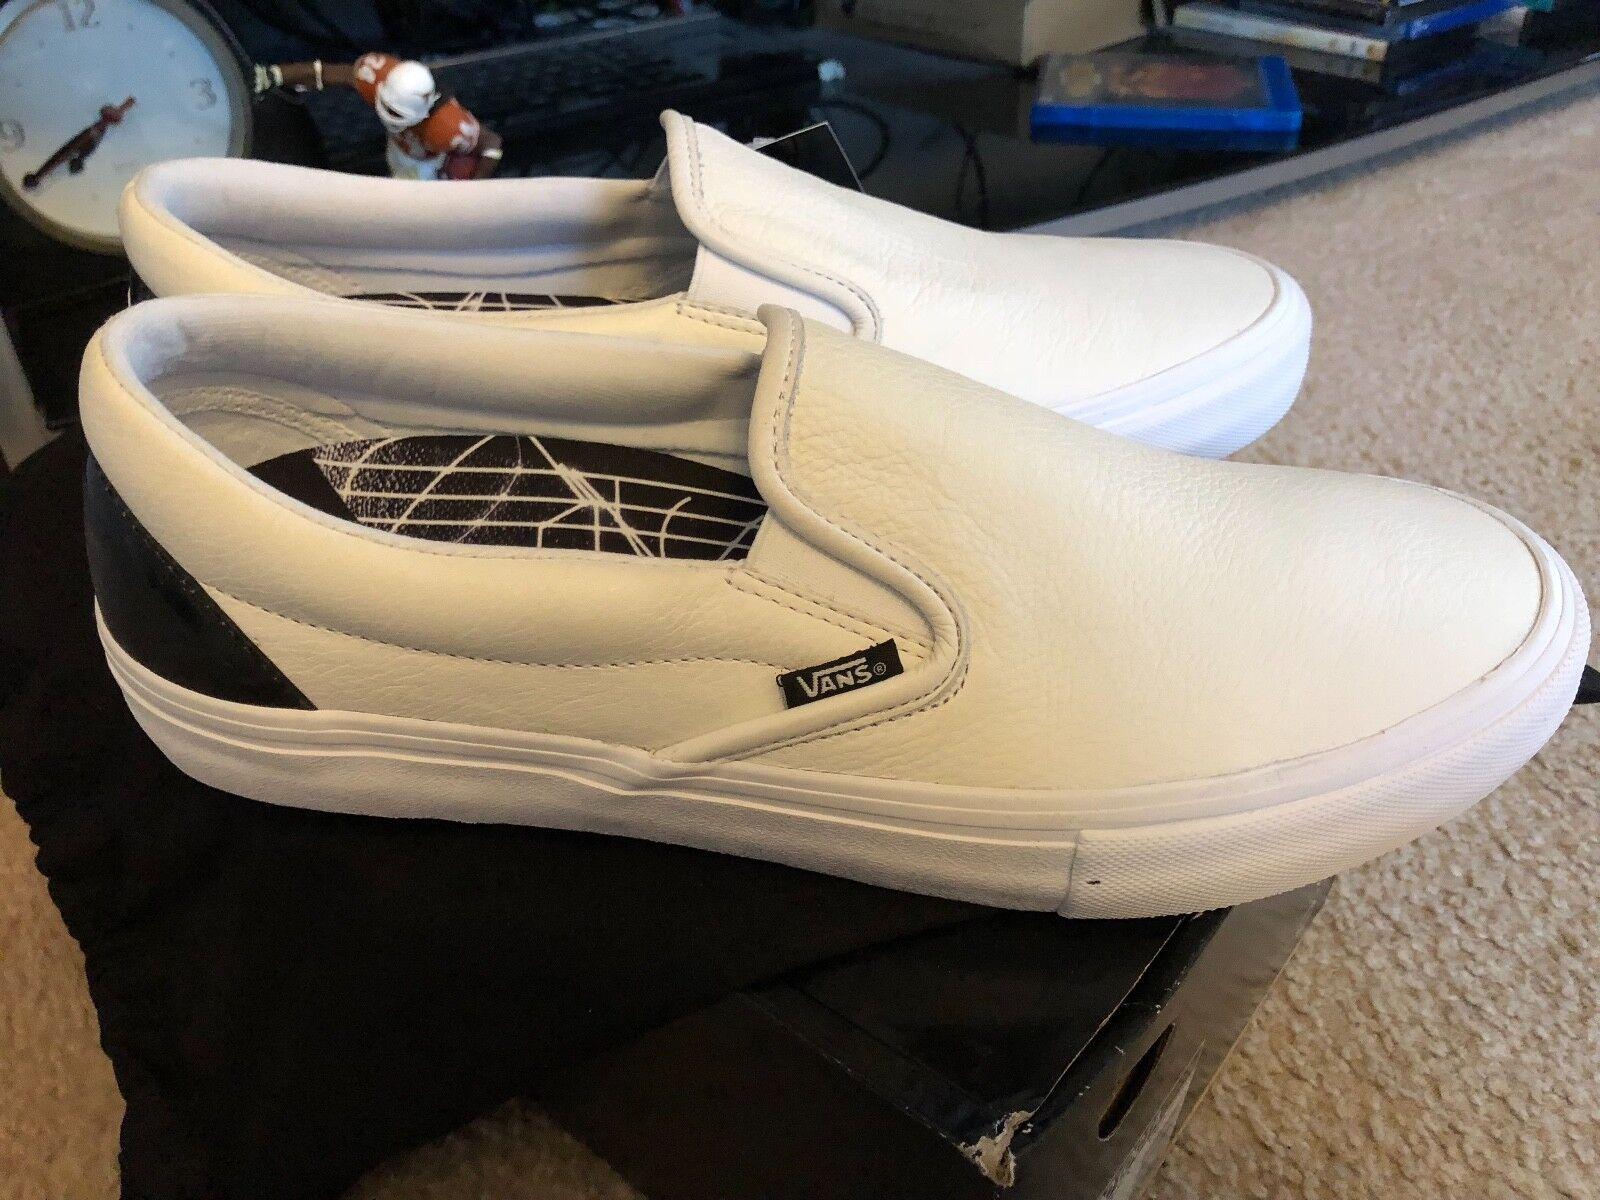 Vans x Octagon Slip-On Pro - True White / Black - New In Box